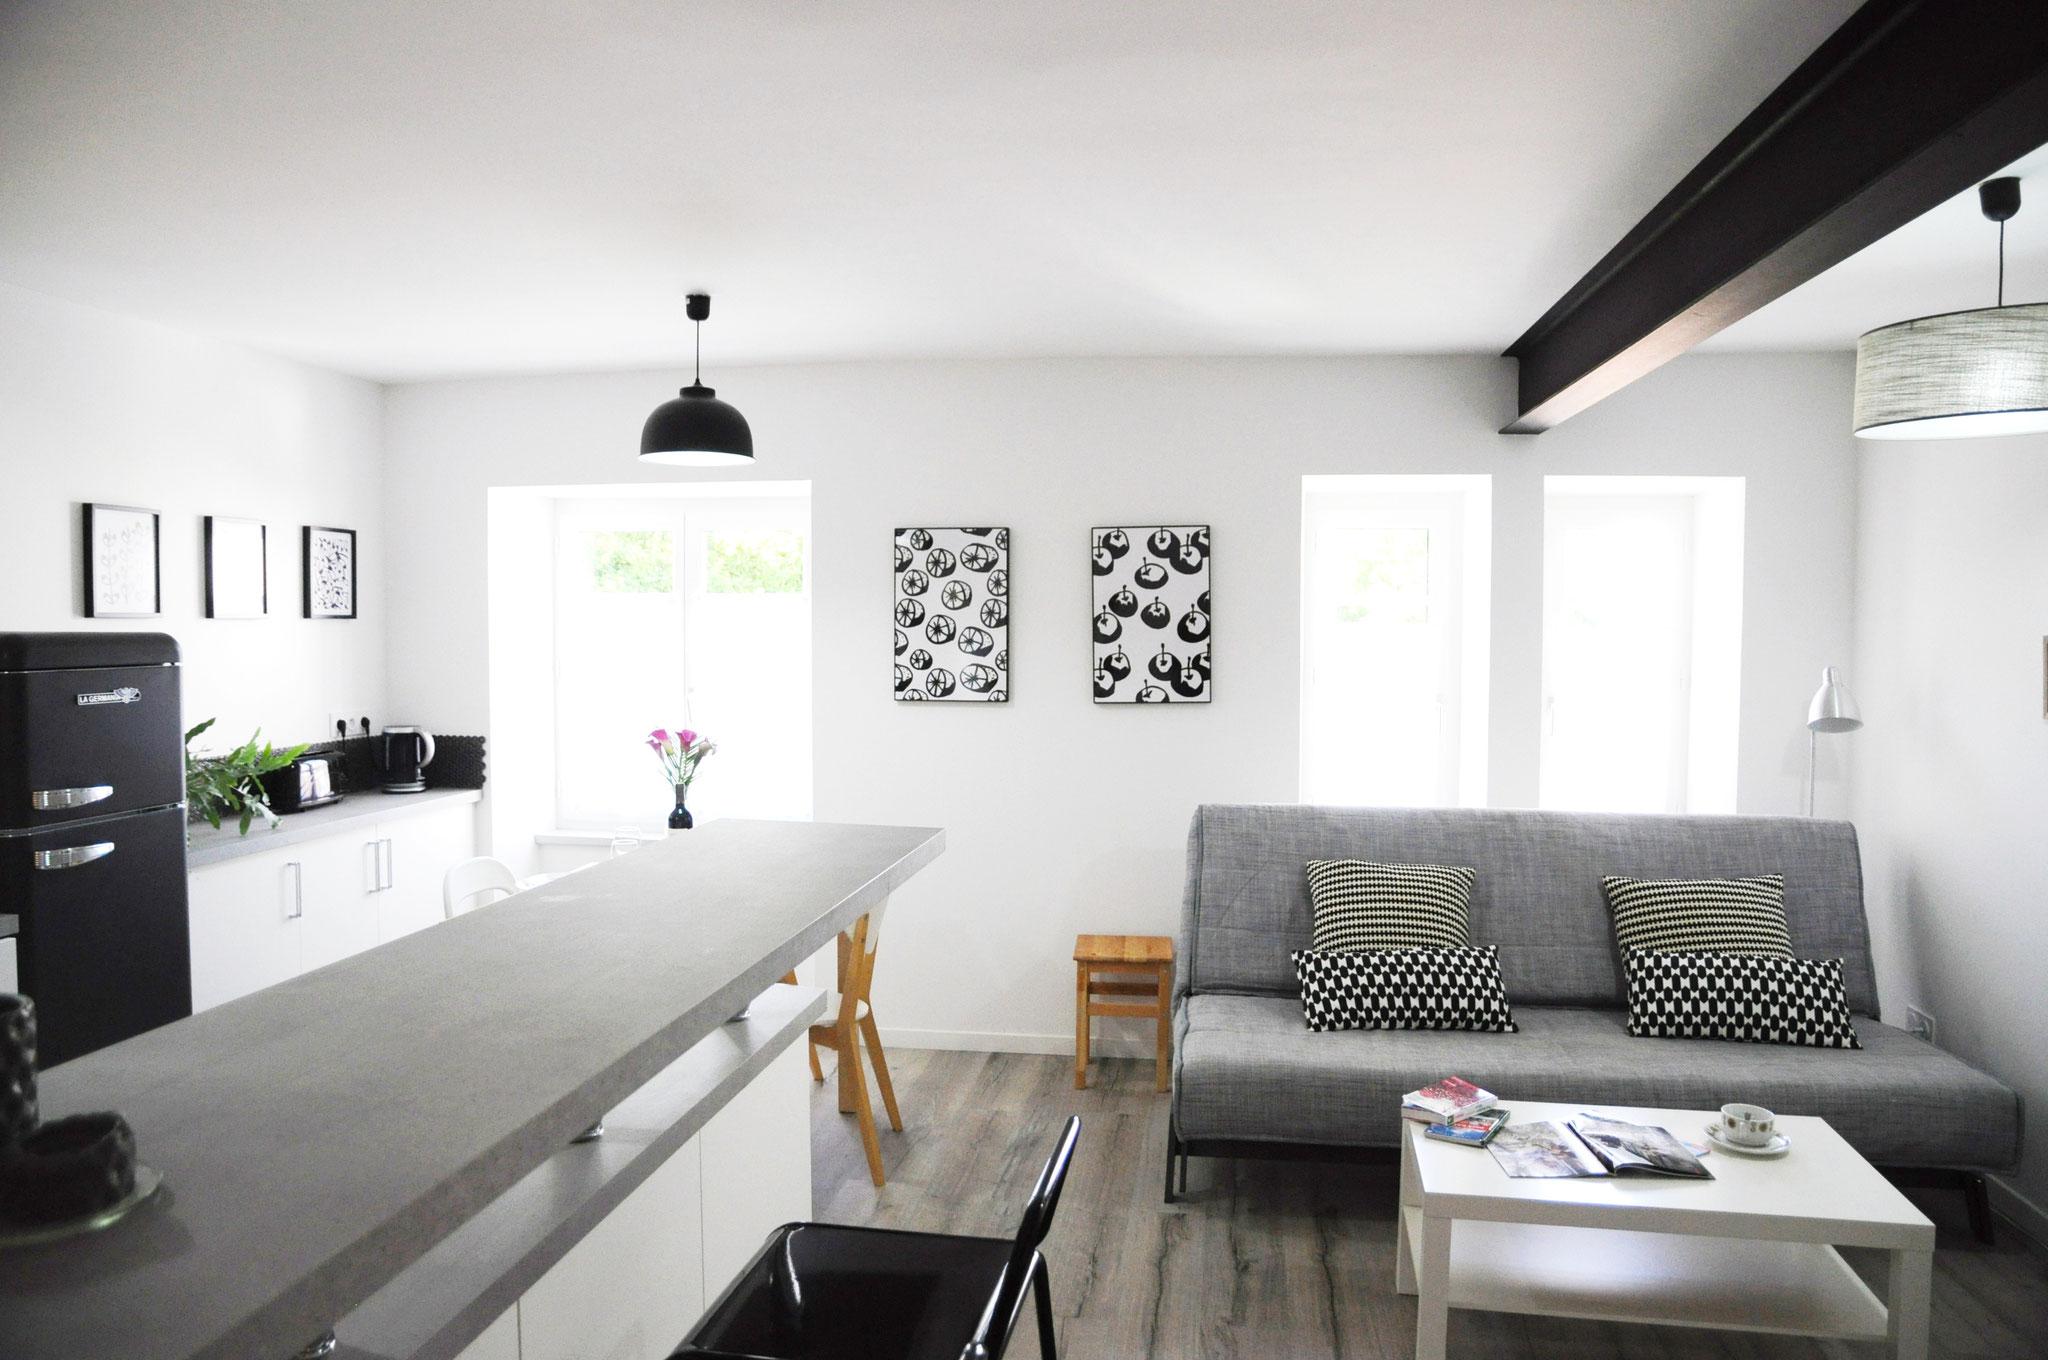 Zokokoa - maison garroenea - gîte de vacances - Pays Basque Sare